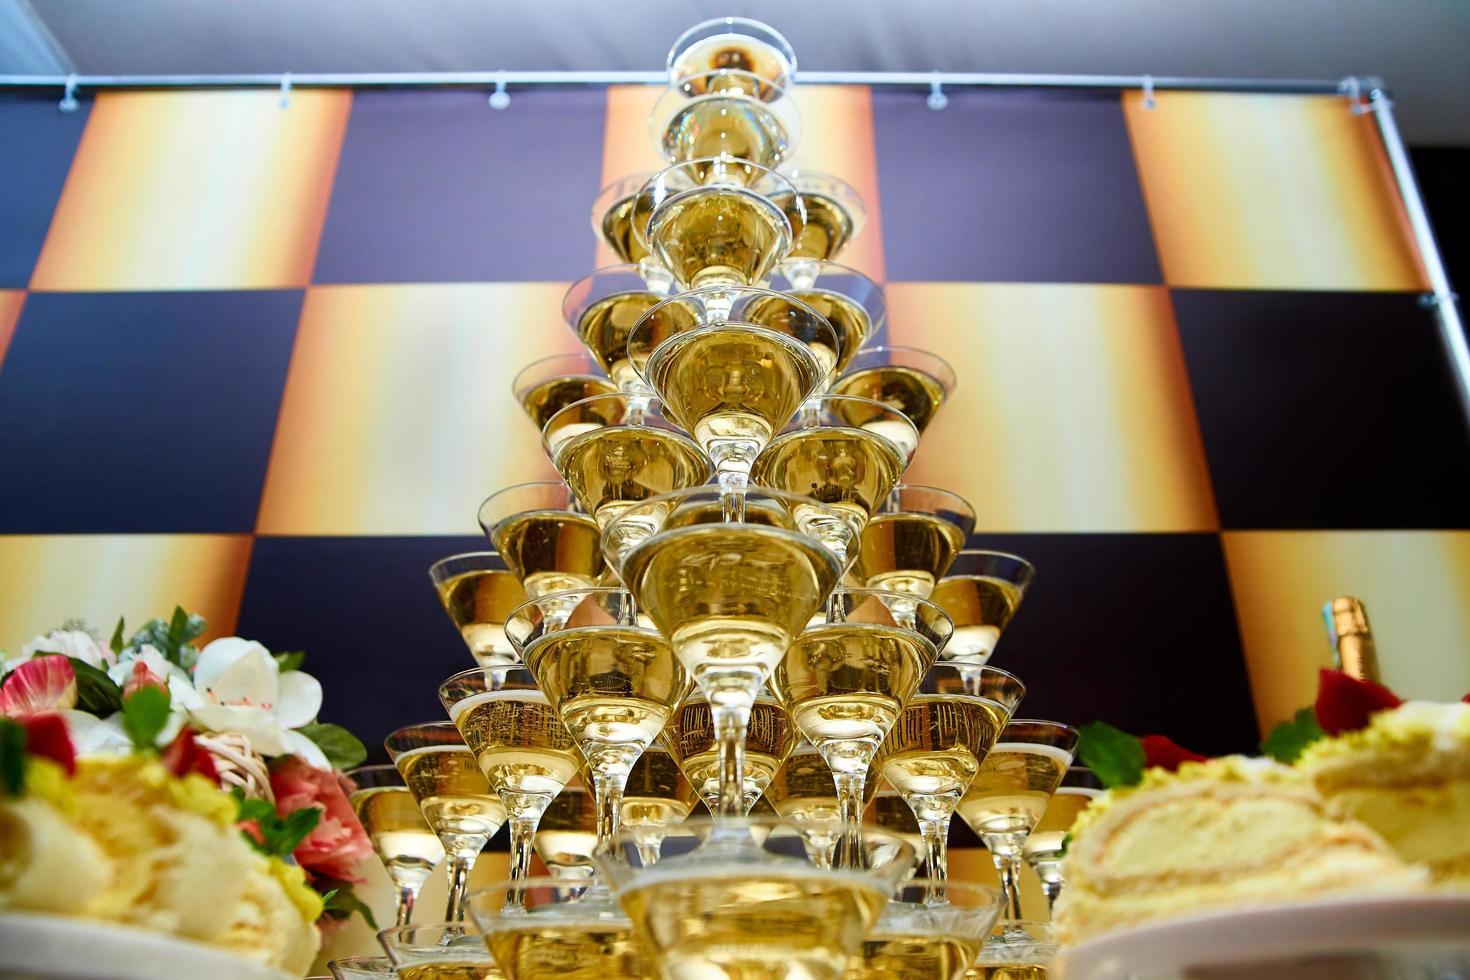 piramide di champagne foto